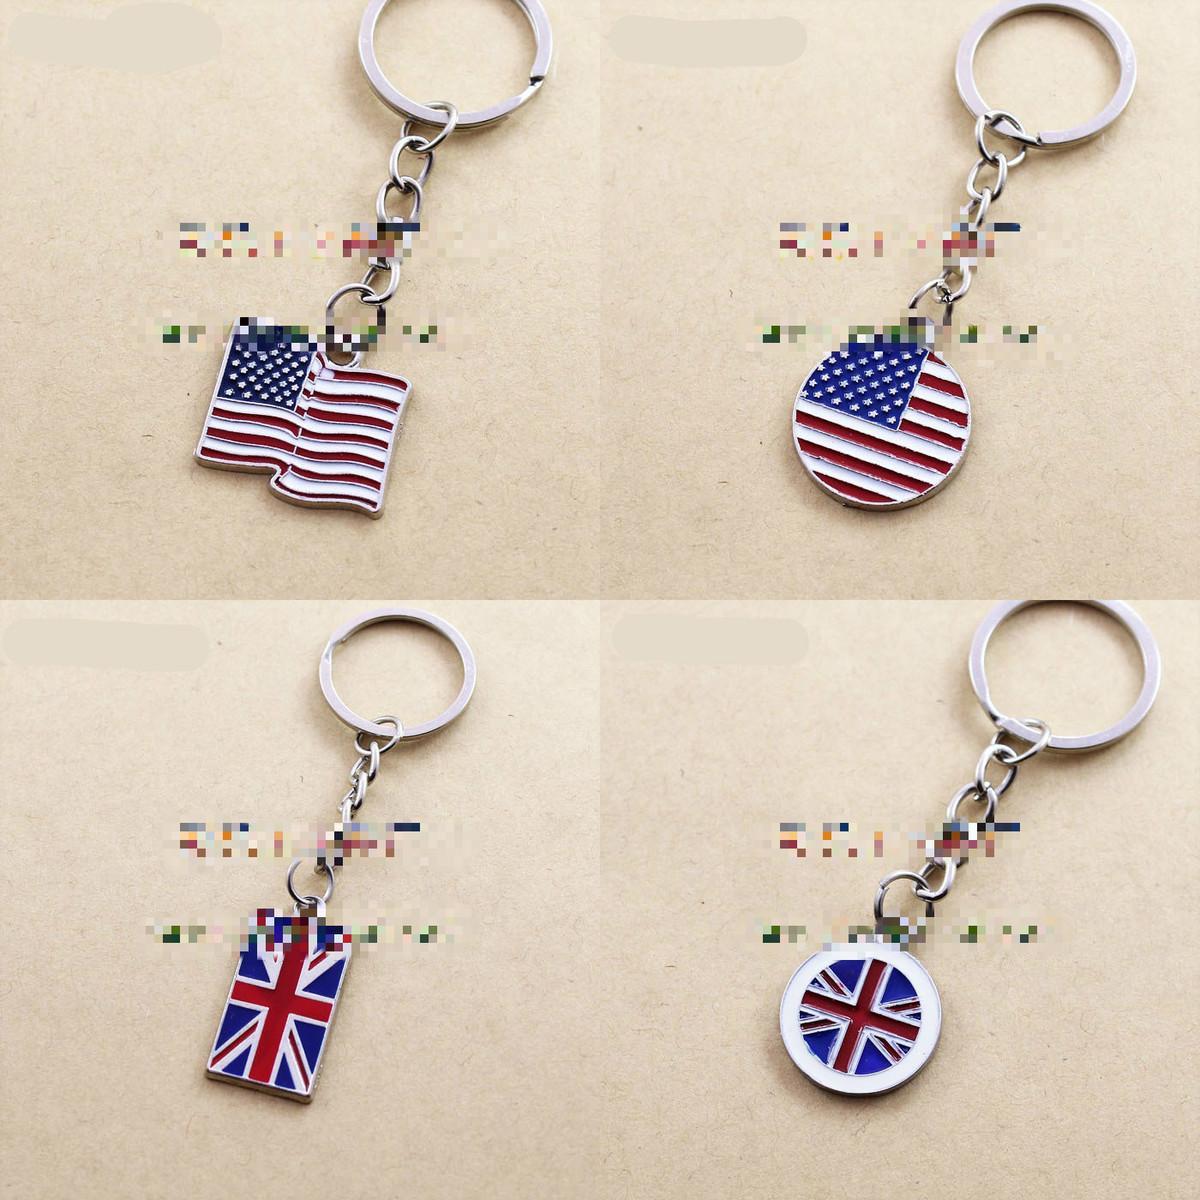 7 Shapes American USA Flag Keychain UK Britain National Flag Keychains Car Key  Ring Holder Bag Womens Handbag Pendant Chocolate Favors Chocolate Party ... 7caf396db